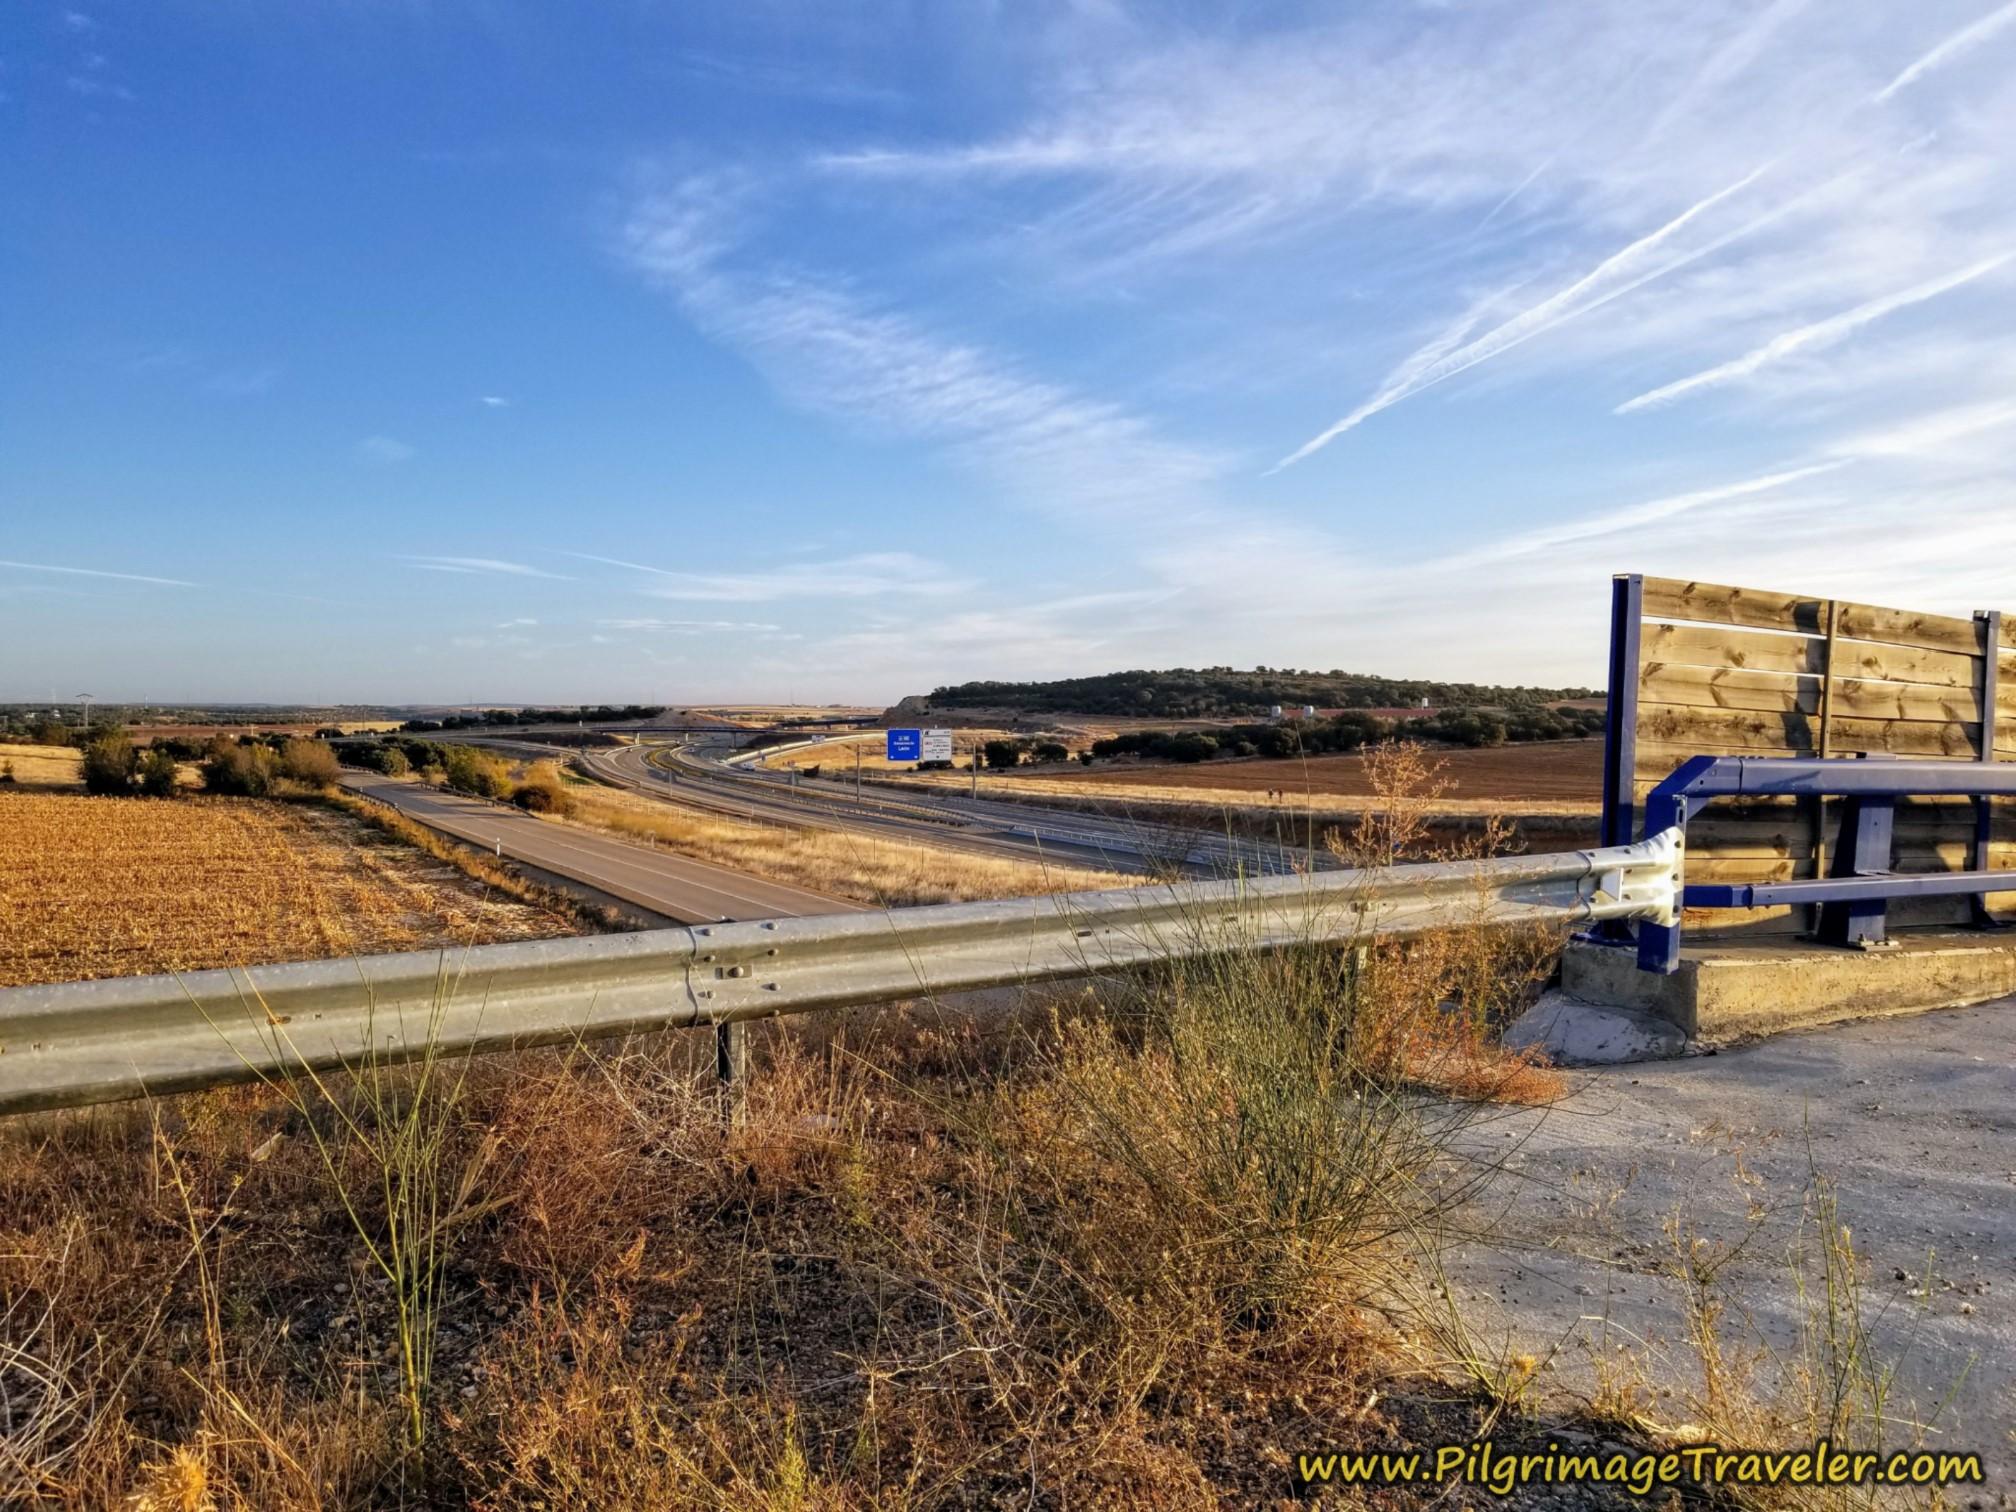 Cross the A-66 on Overpass on the Vía de la Plata from Montamarta to Granja de Moreruela